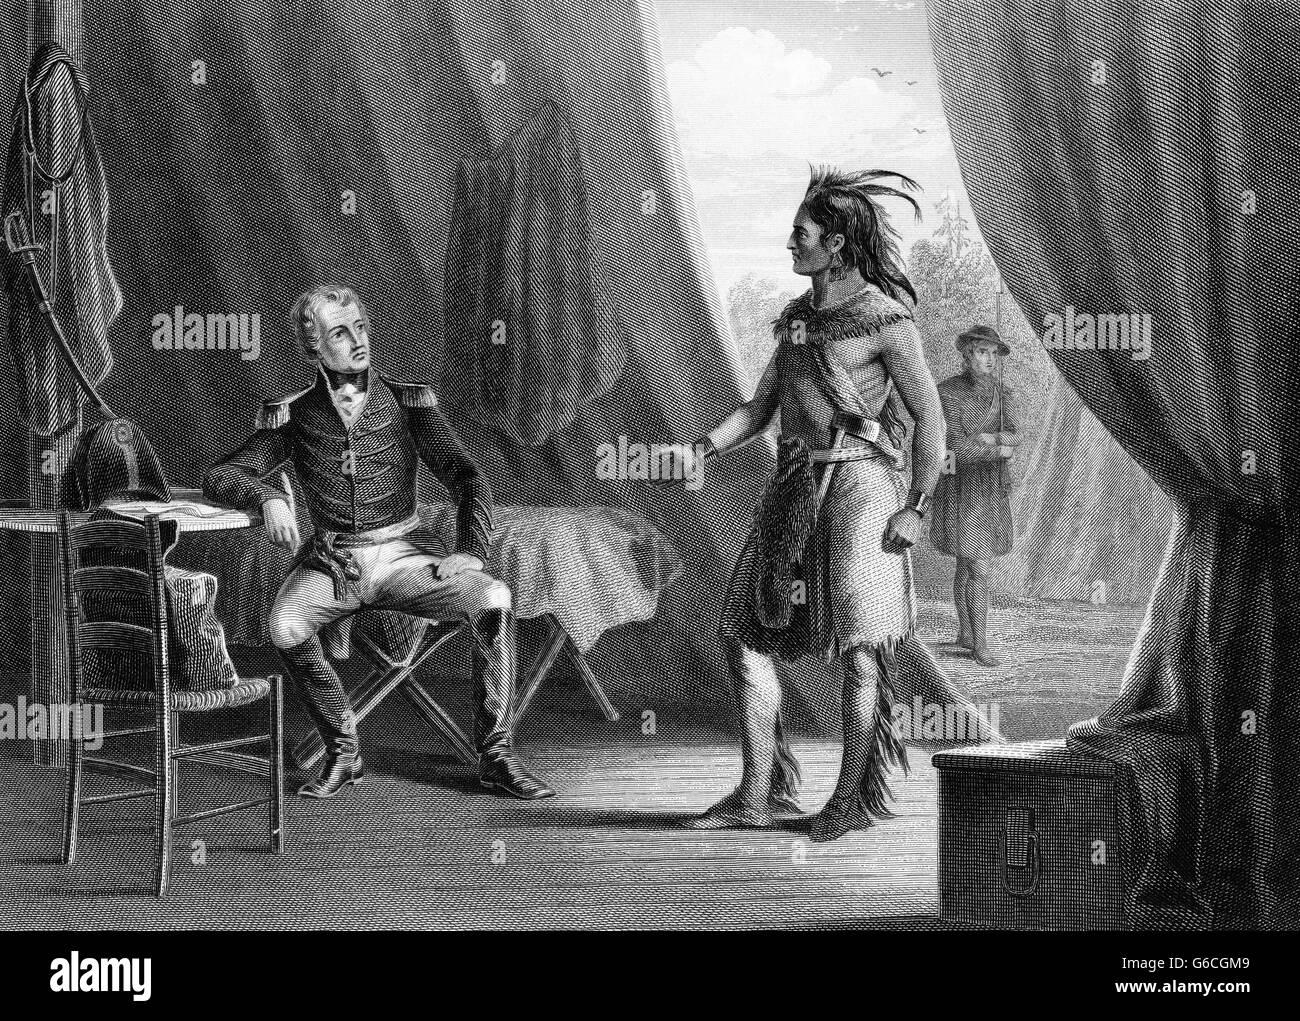 1814 GENERAL ANDREW JACKSON & RED EAGLE WEATHERFORD AFTER INDIAN DEFEAT BATTLE OF HORSESHOE BEND ALABAMA CREEK - Stock Image